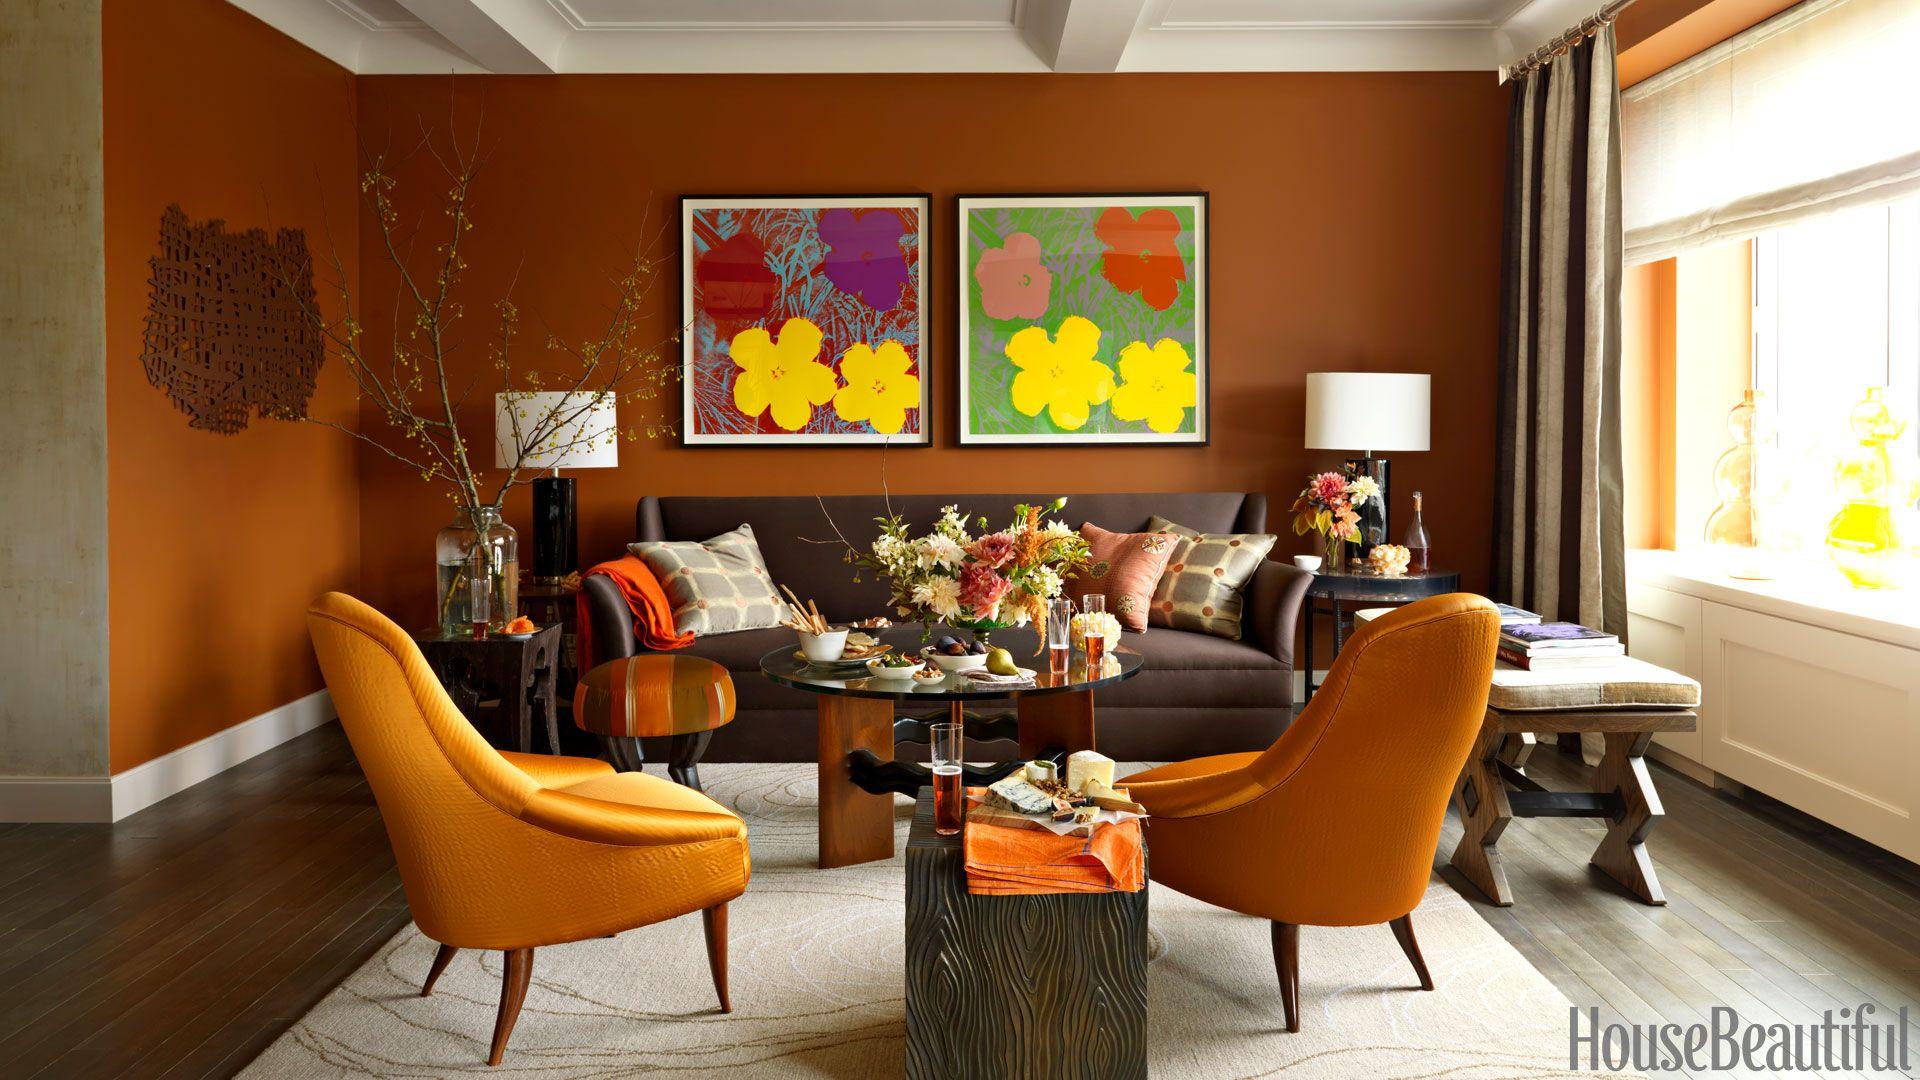 Orange Midcentury Modern Chairs. Thomas Loof. Whatu0027s Clear Is ...